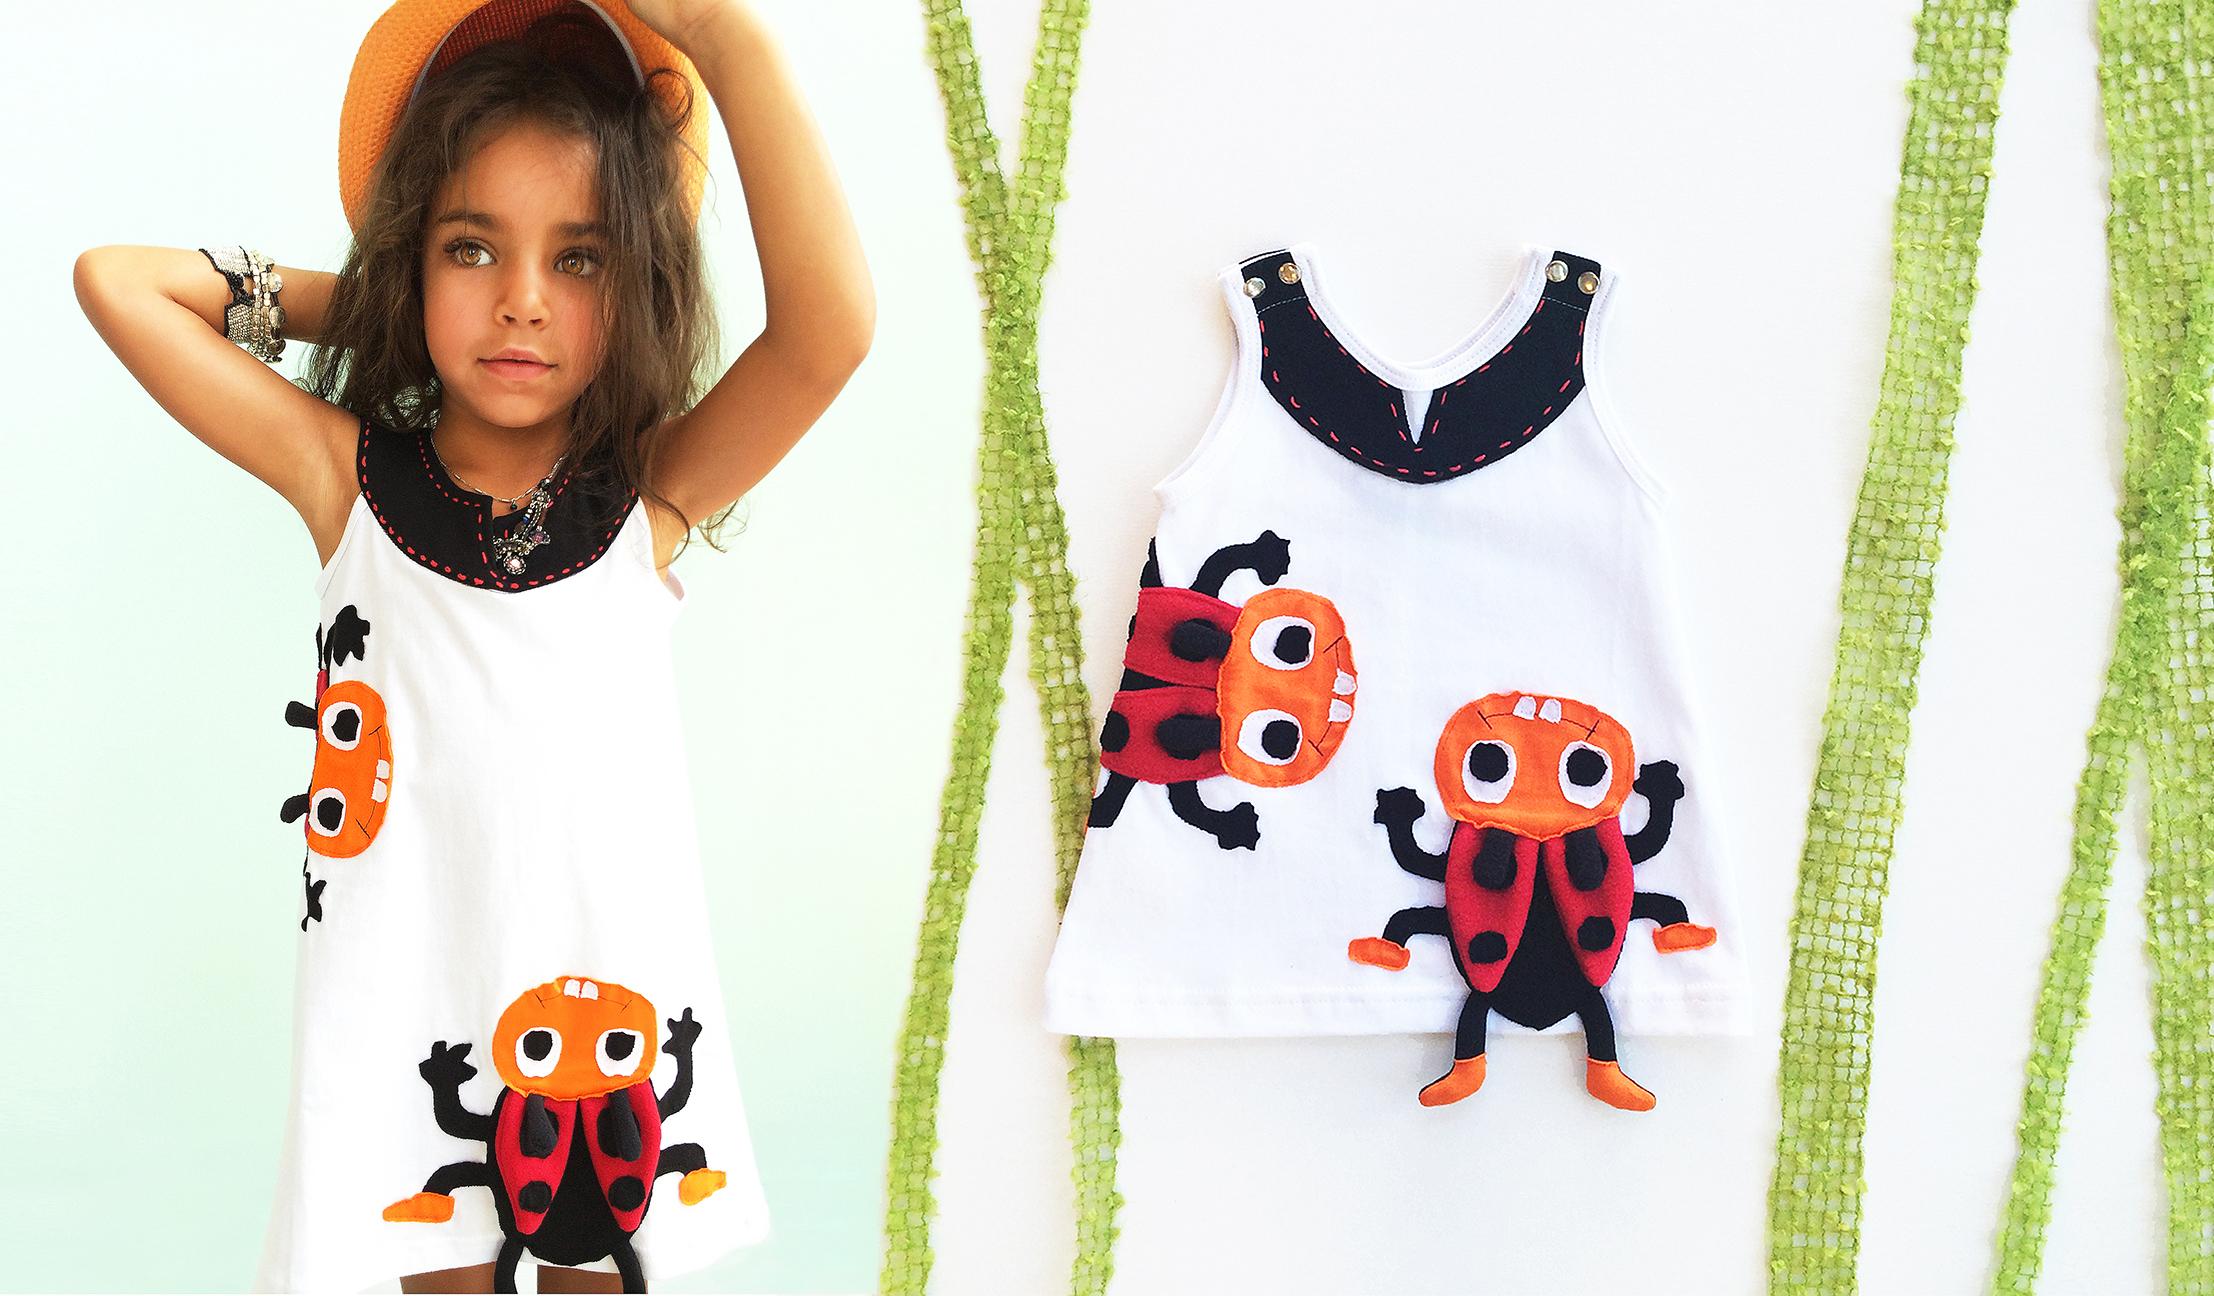 Ladybug+Dress.jpg